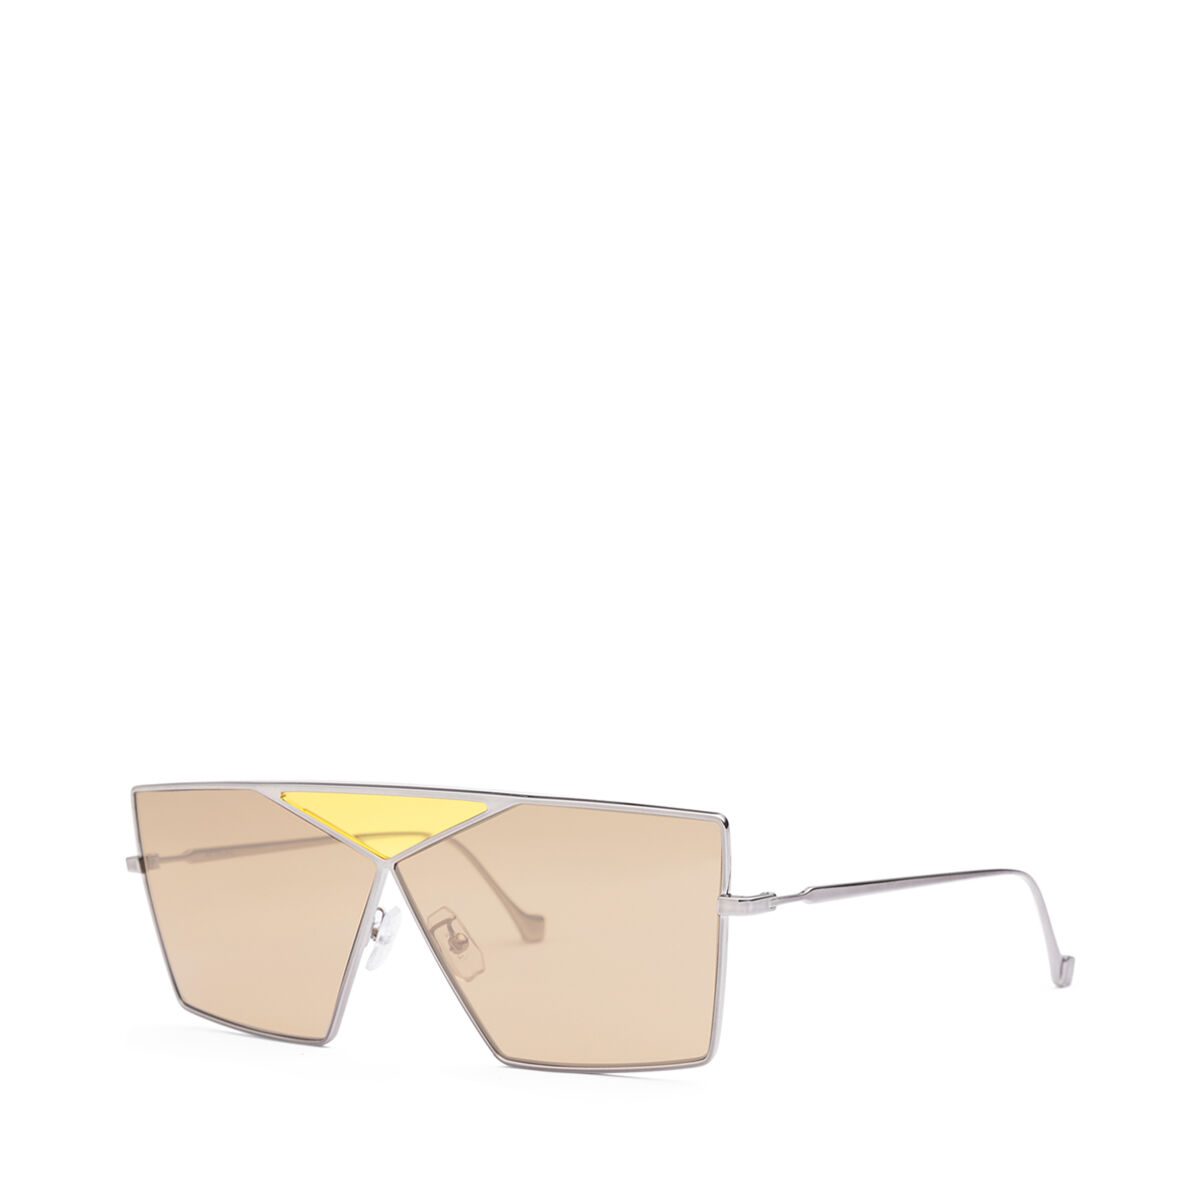 LOEWE Gafas Cuadradas Puzzle Rutenio Claro/Marron all